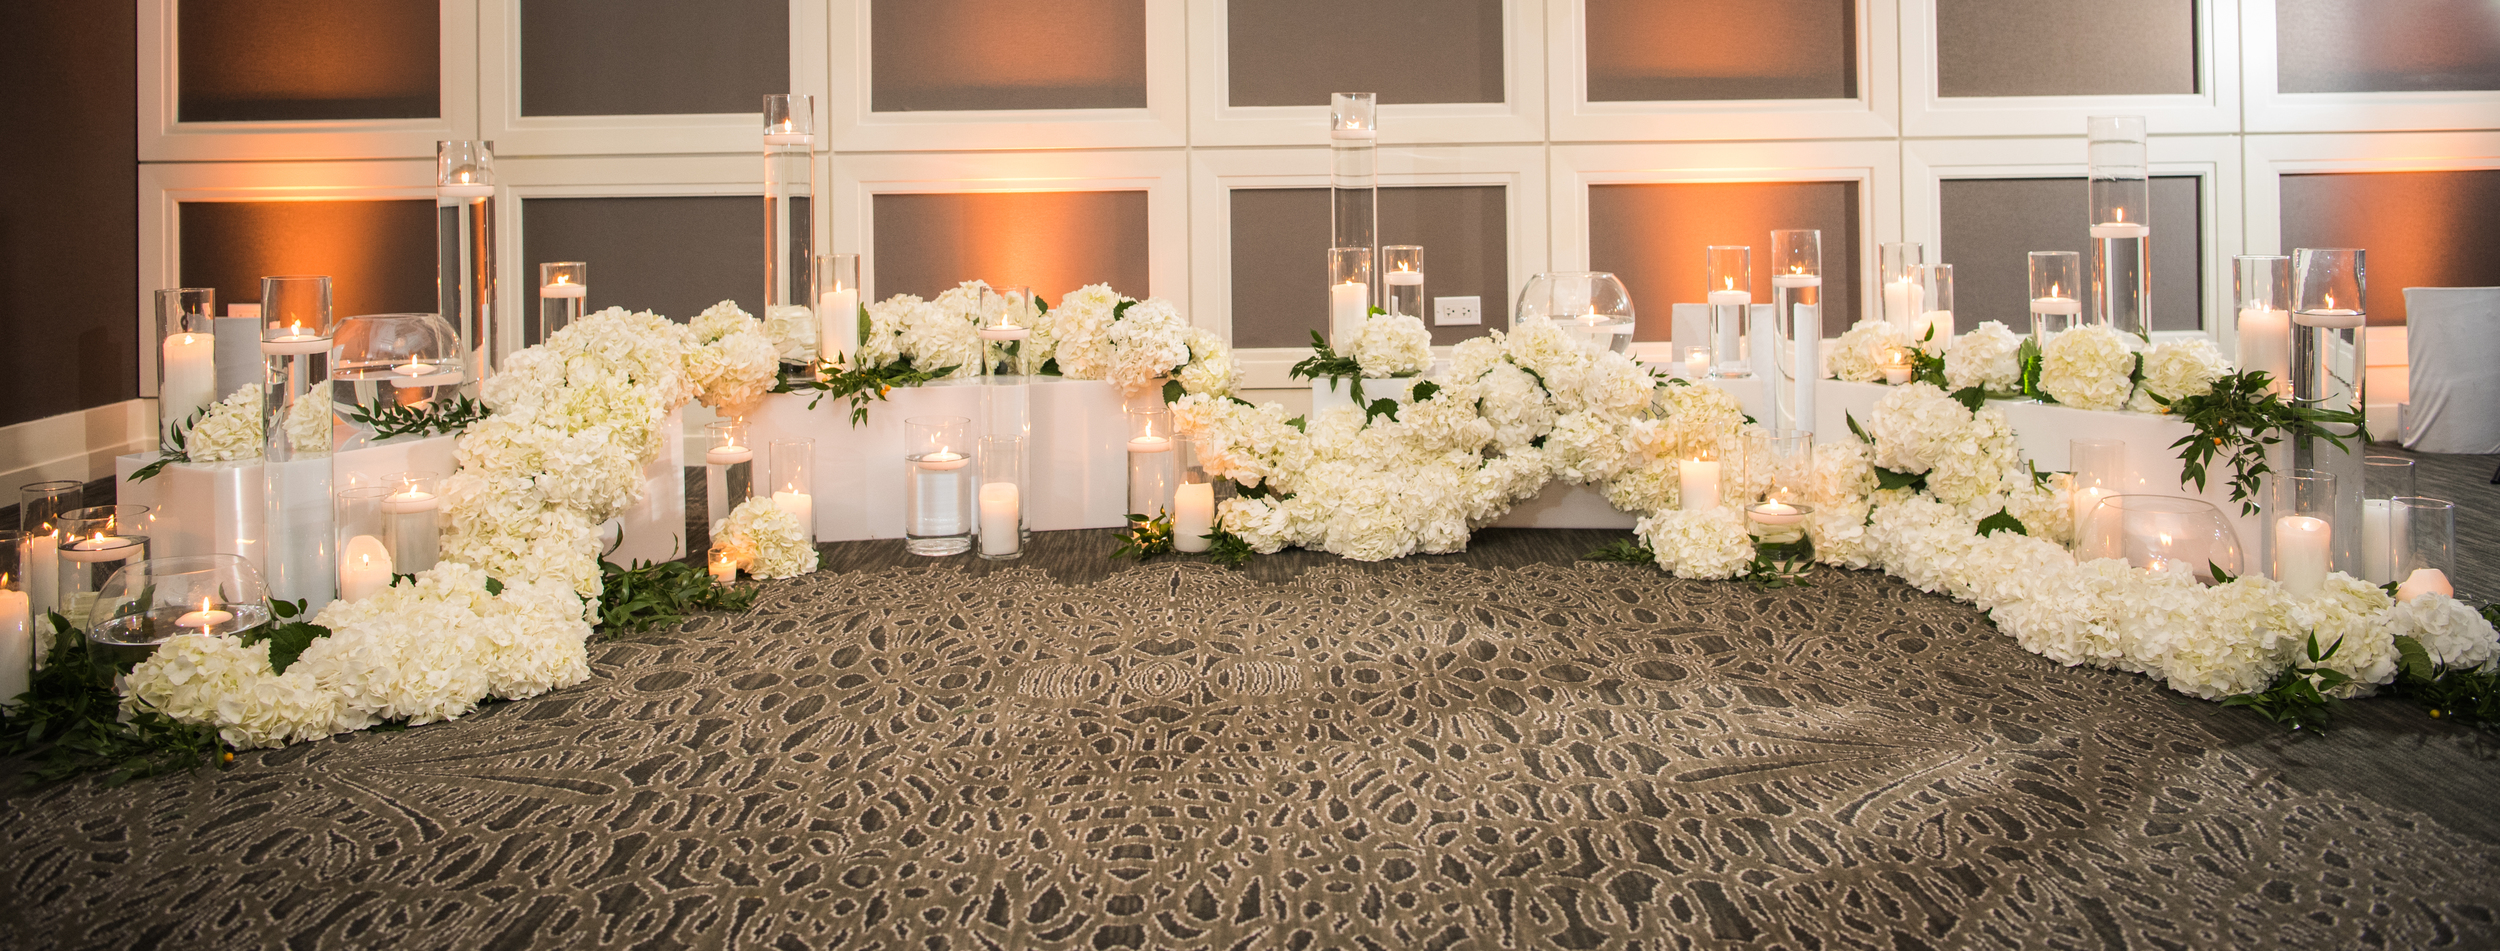 unique-wedding-ceremony-chicago.jpg